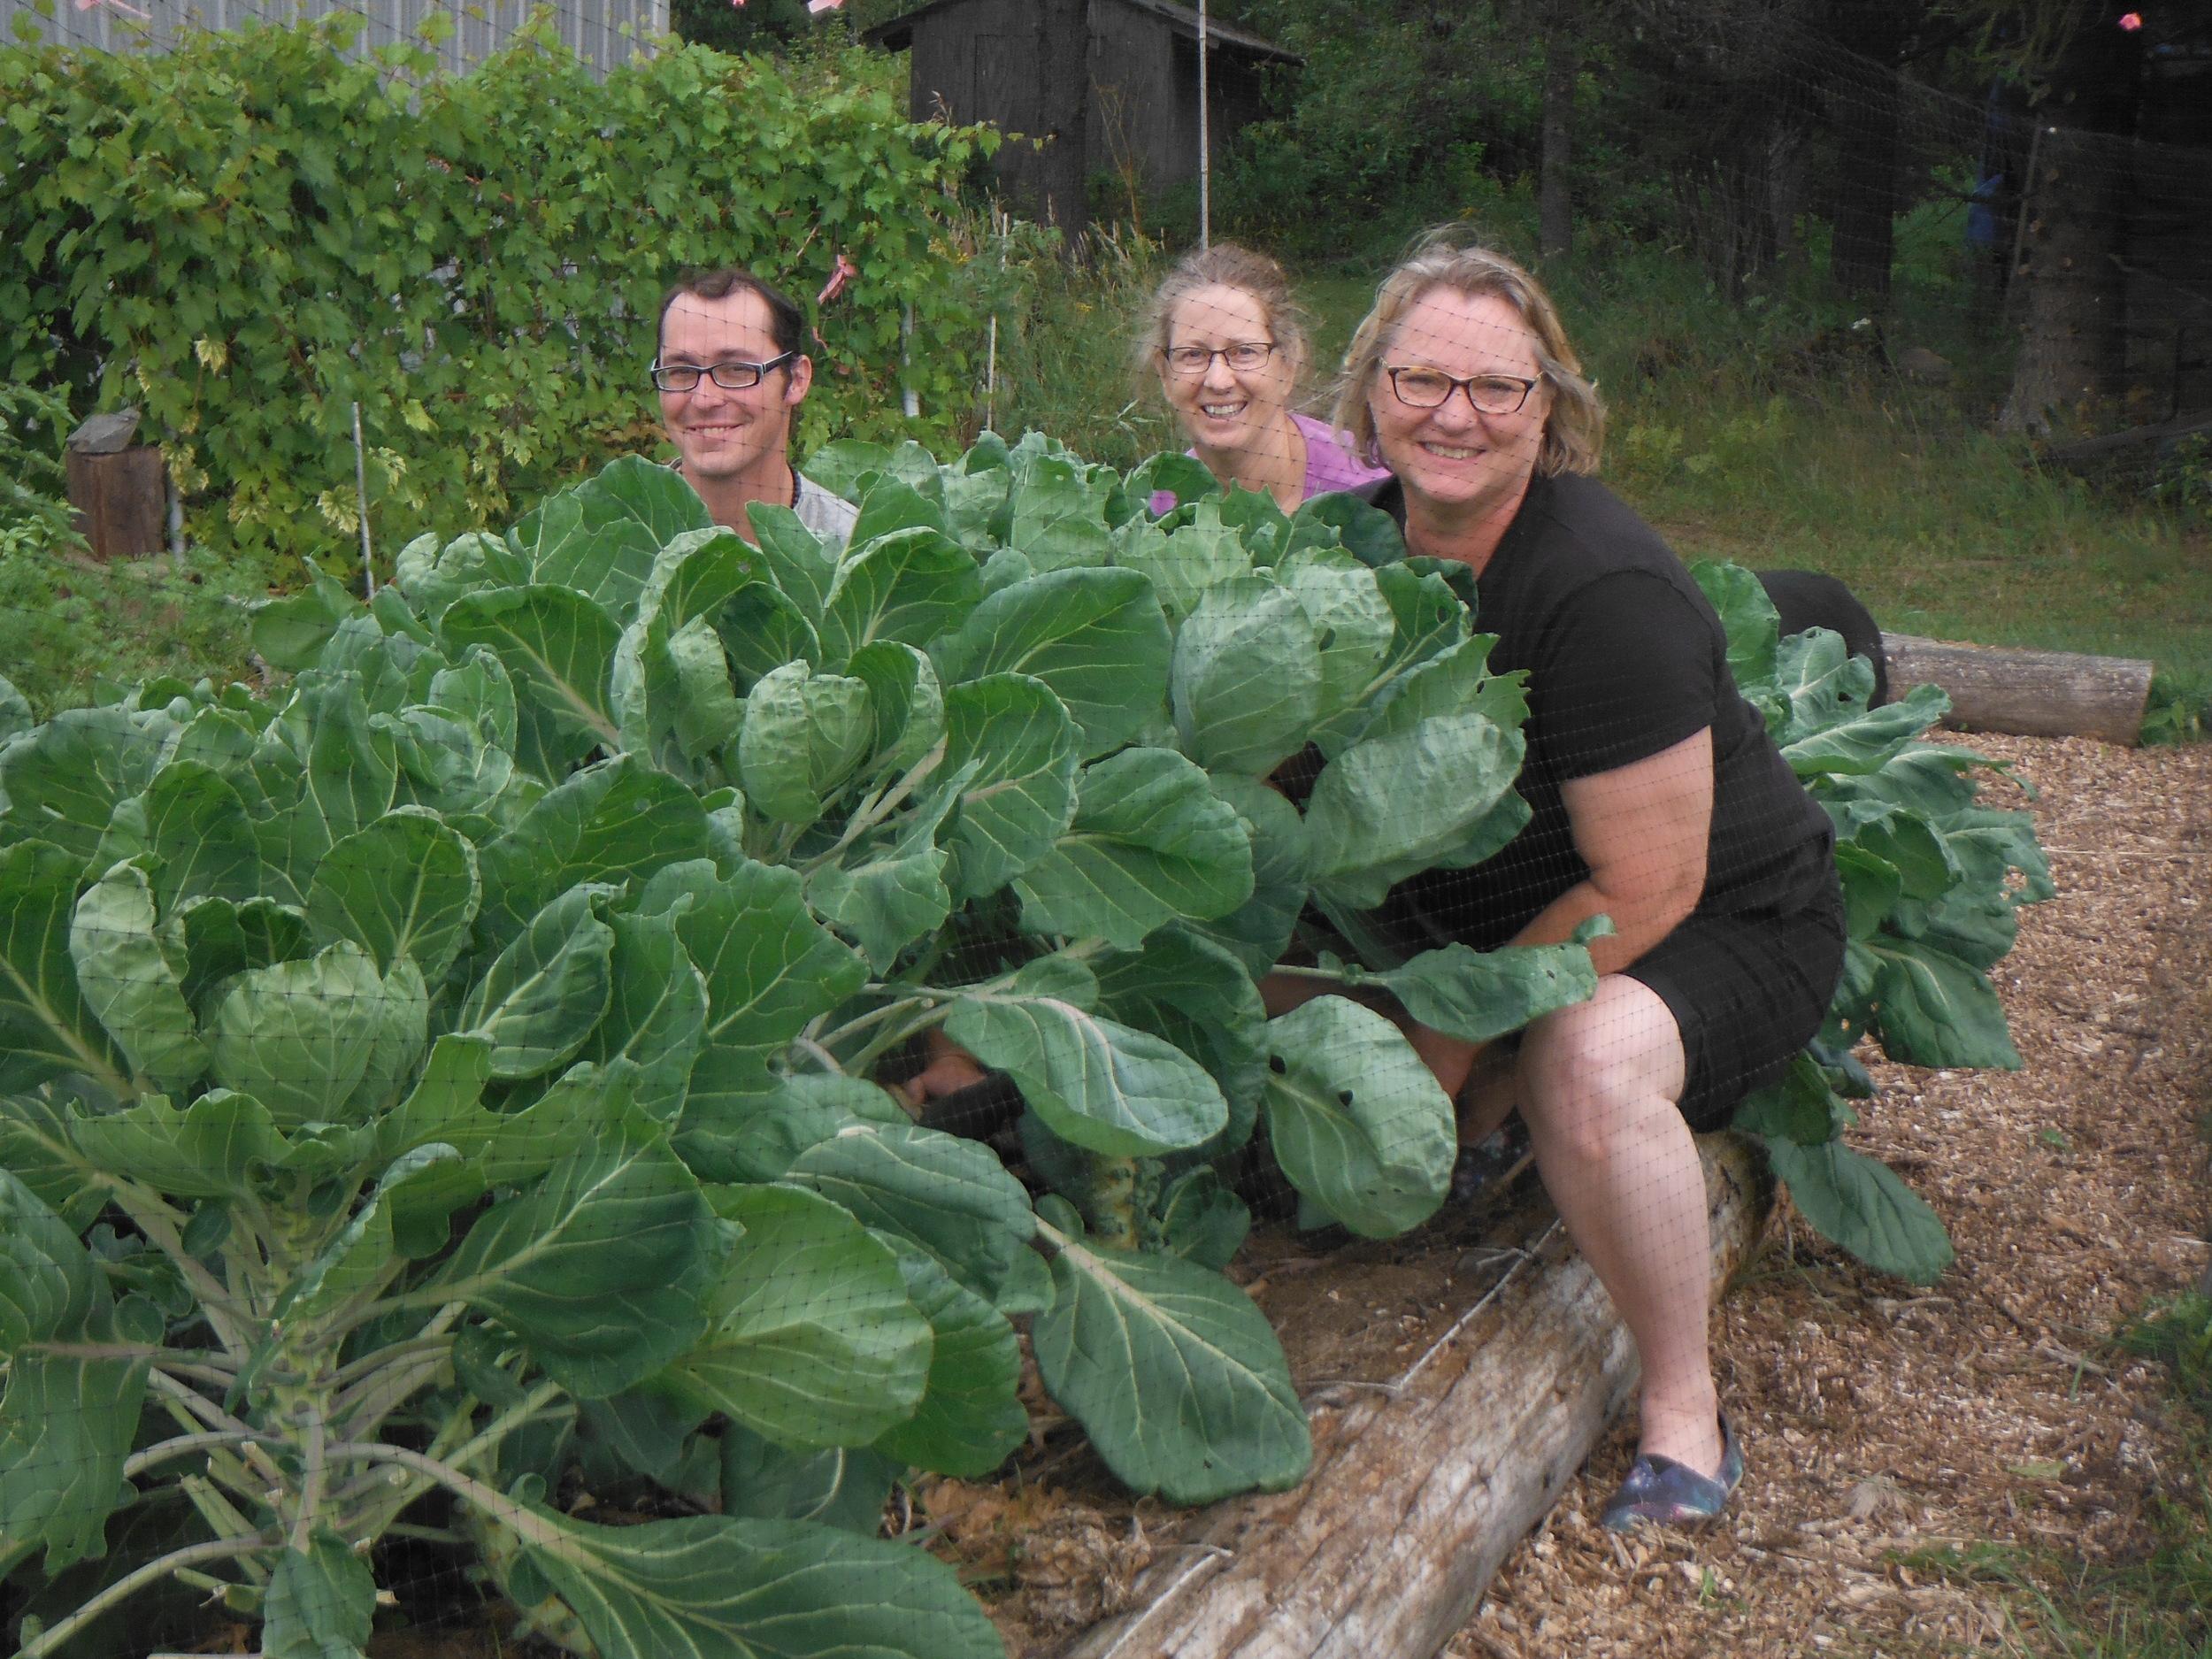 Garden Gurus! Photo credit: Gail Bong